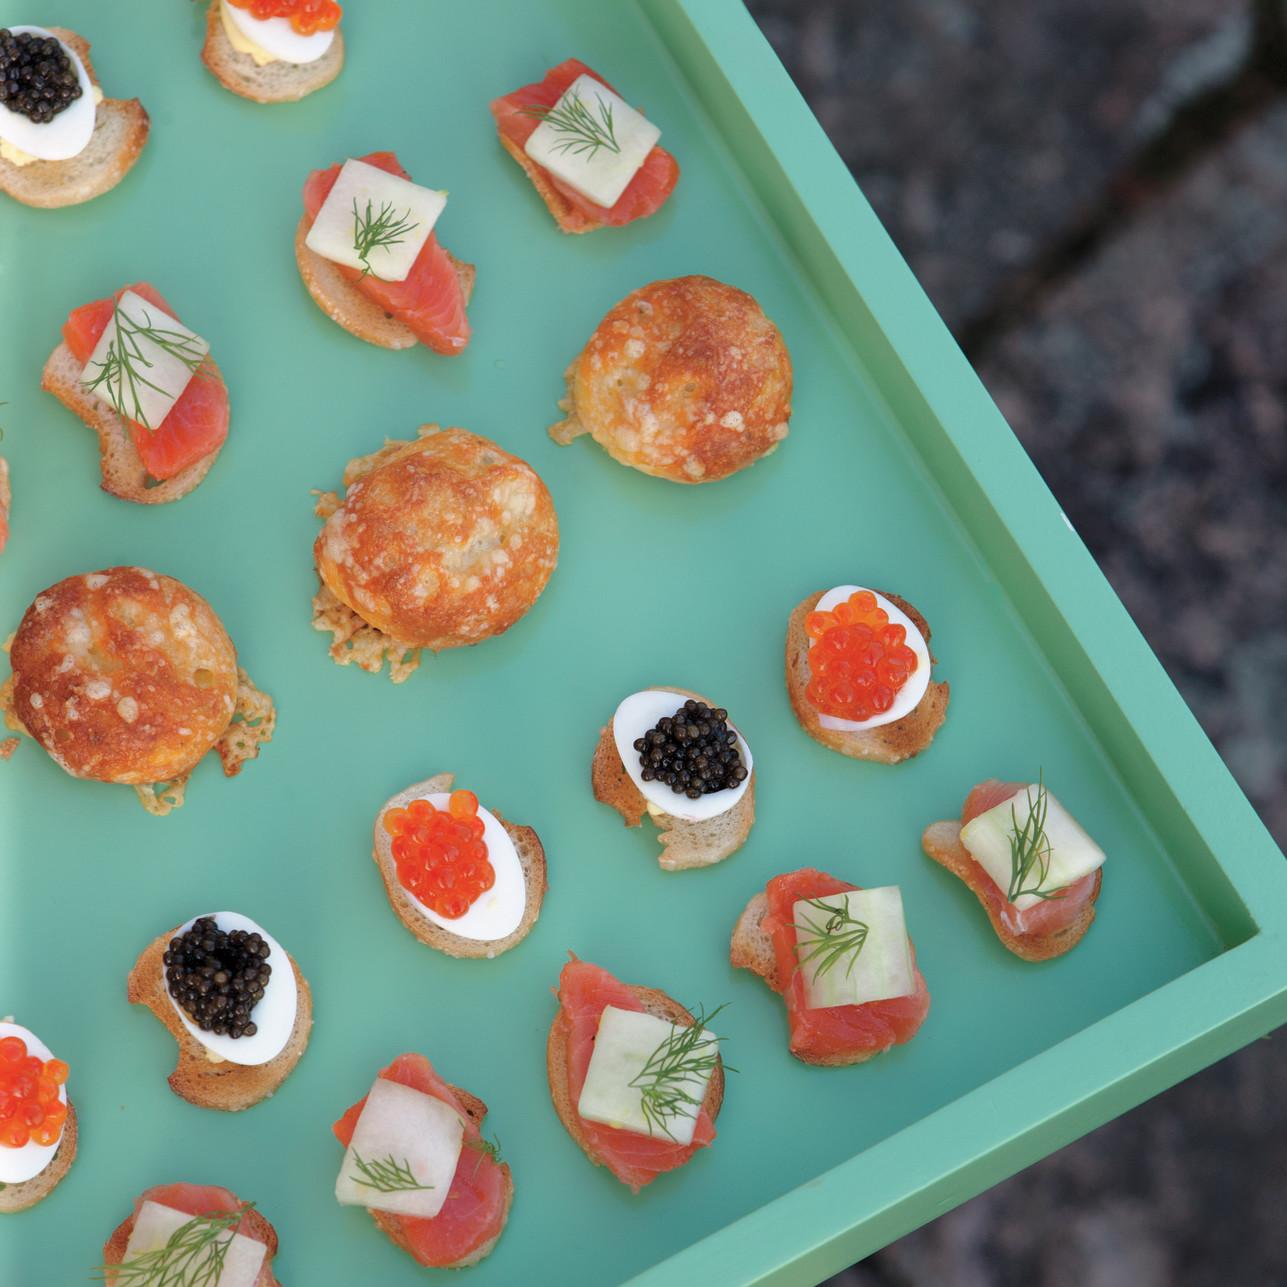 Deviled Quail Eggs with Caviar